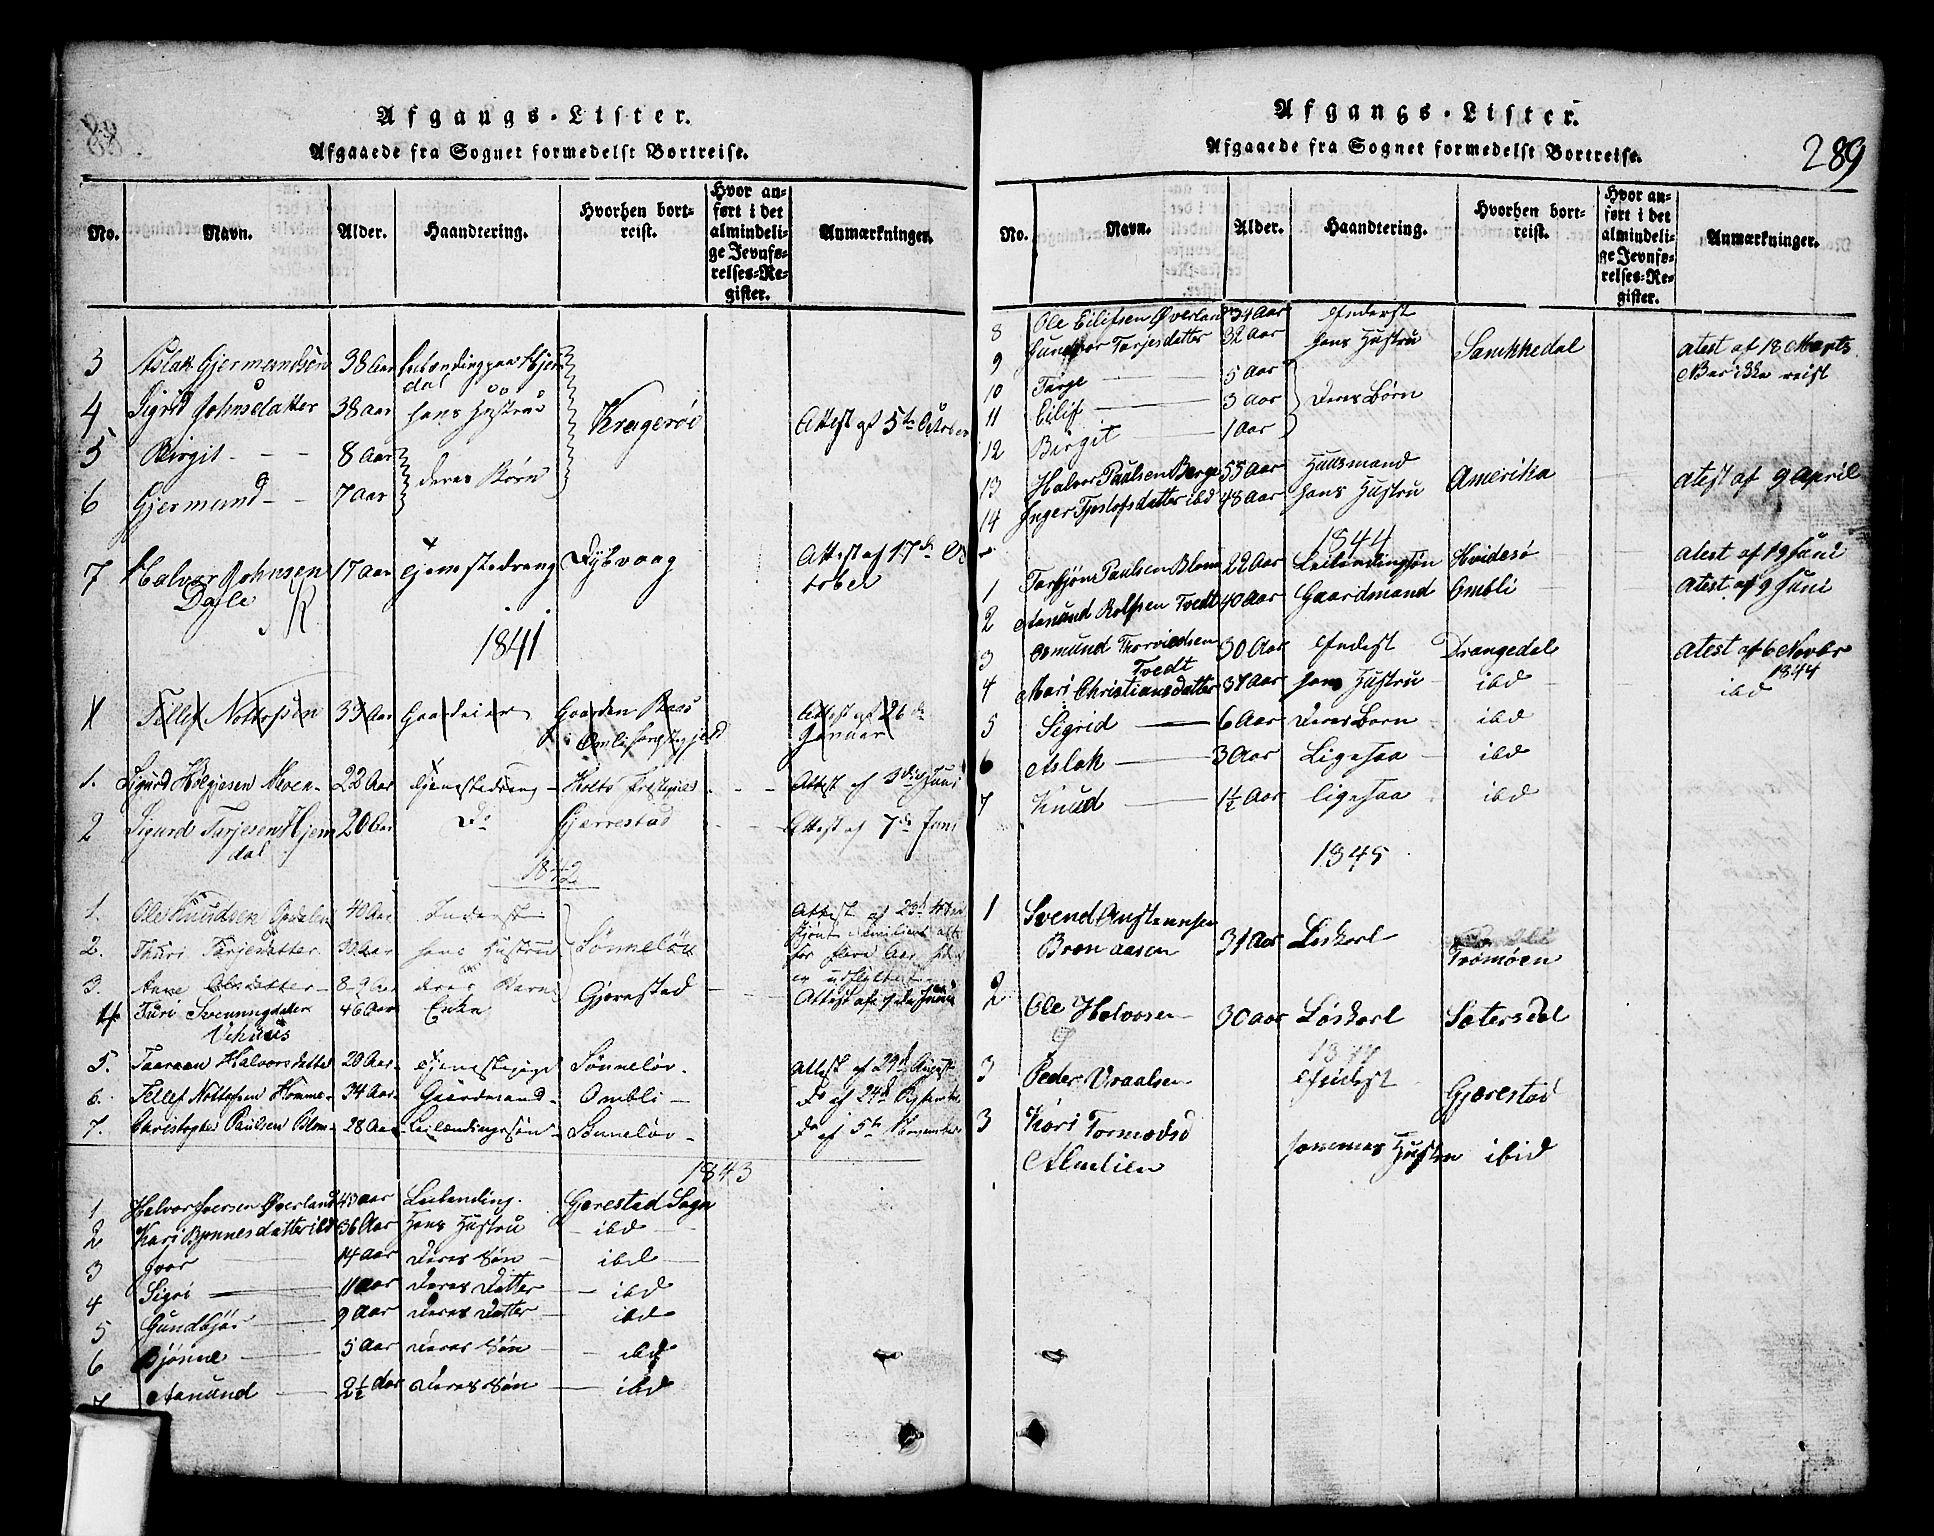 SAKO, Nissedal kirkebøker, G/Gb/L0001: Klokkerbok nr. II 1, 1814-1862, s. 289